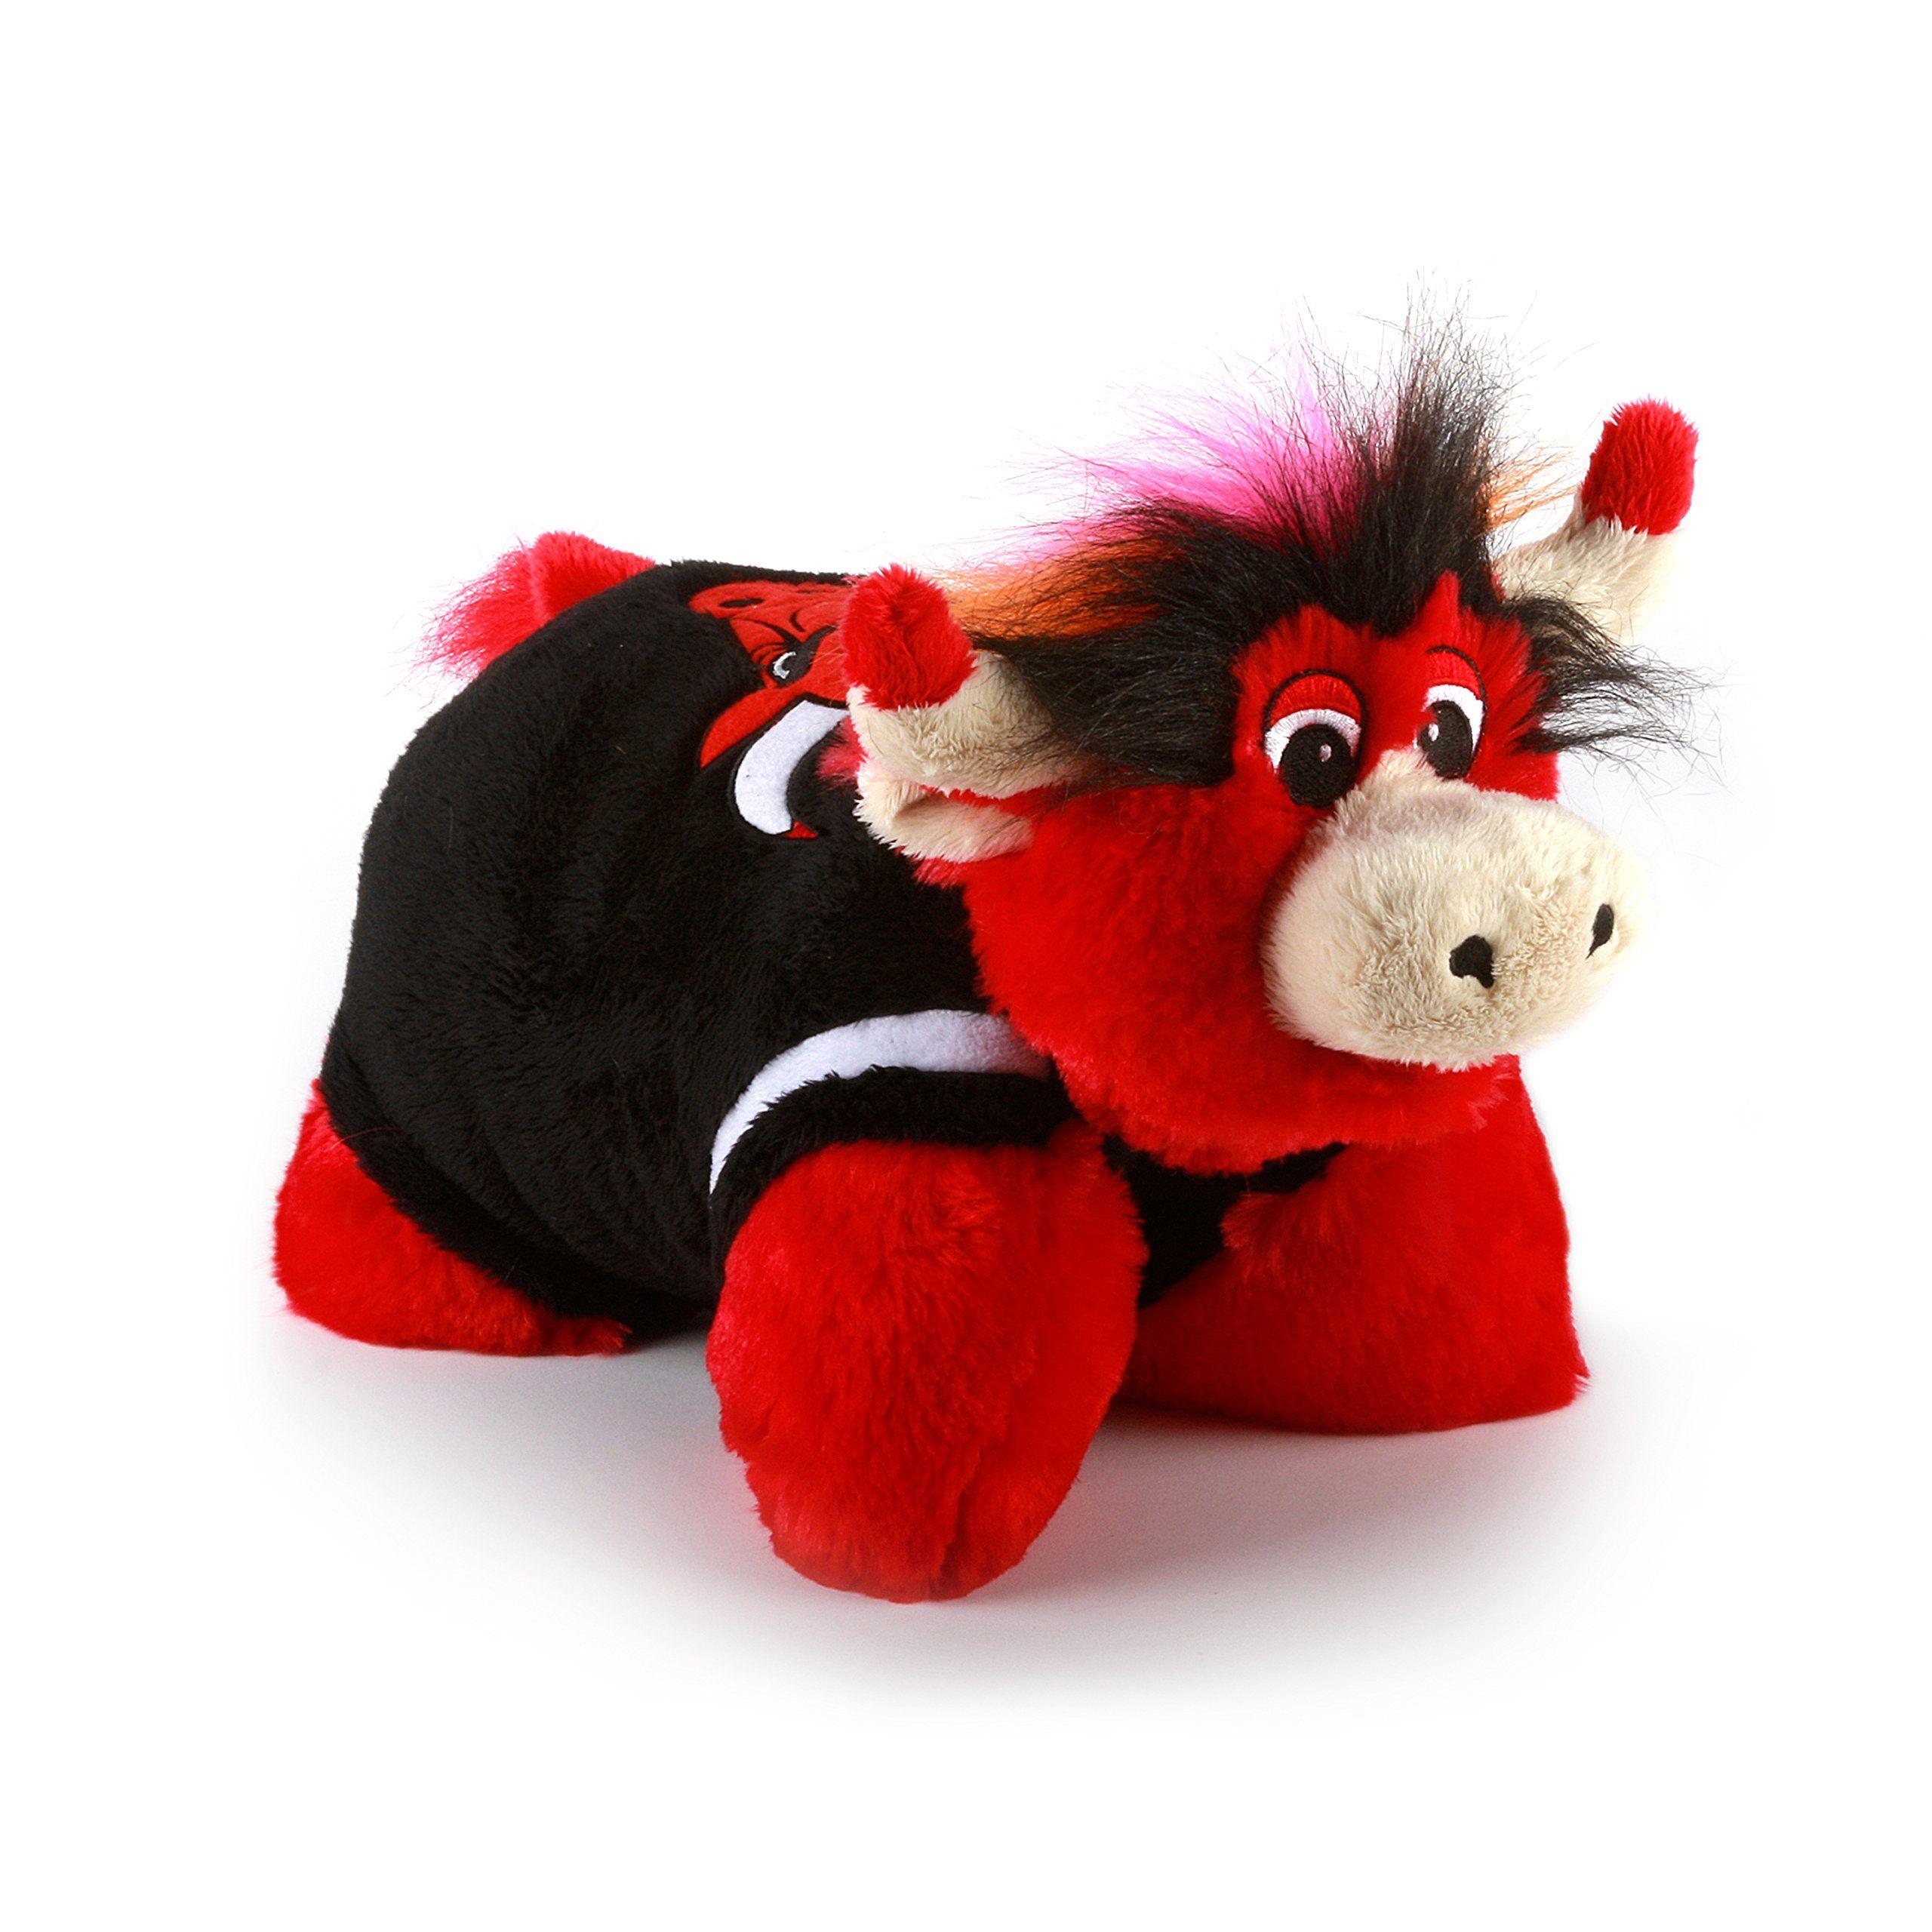 Amazon Com Nba Chicago Bulls Mini Pillow Pet Medium Red Sports Fan Pillow Sports Outdoors Animal Pillows Plush Pillows Pets